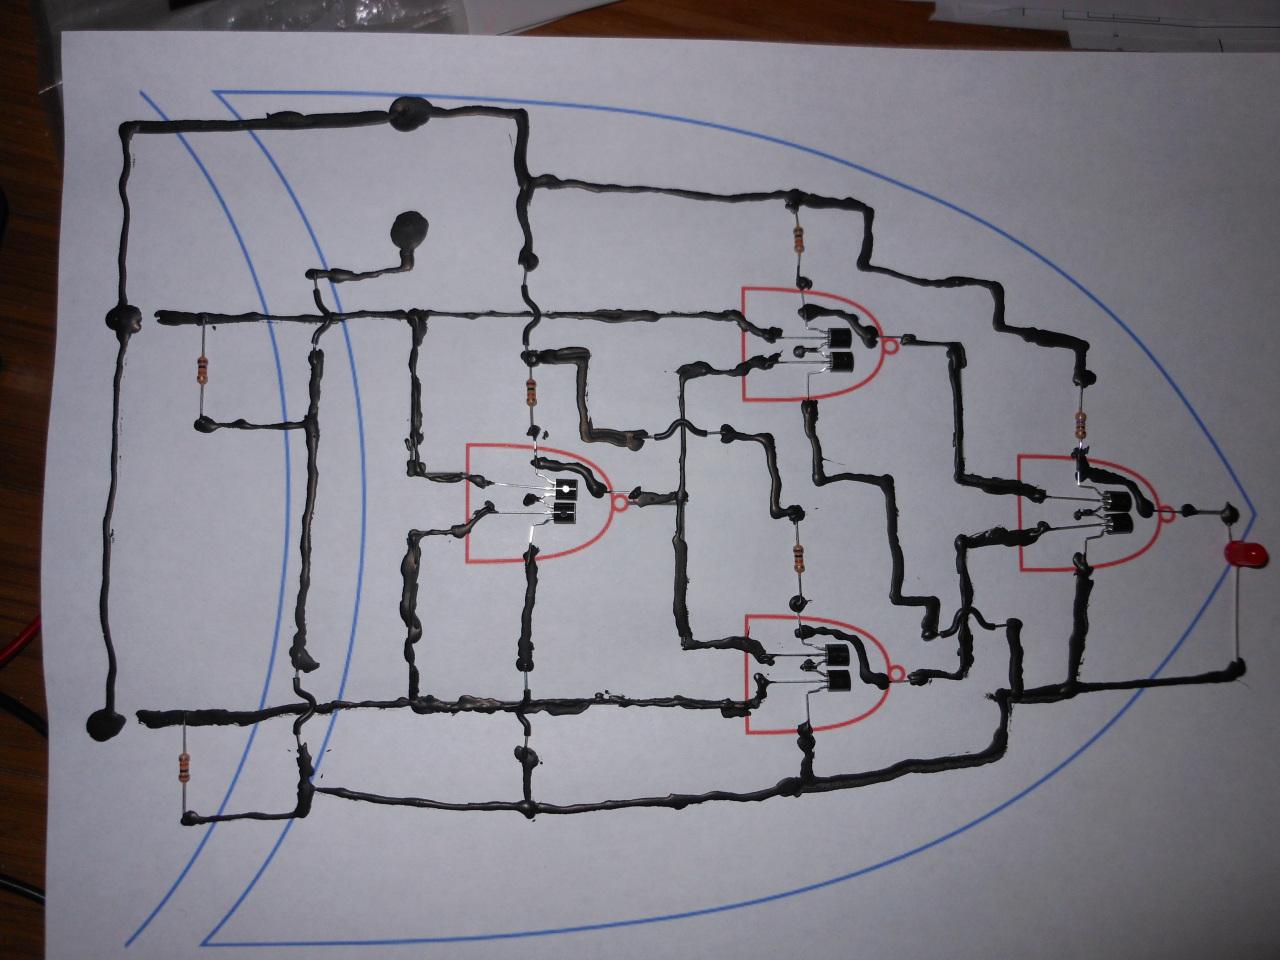 Michael Kohn Conductive Paint Xor Gate Diagram From Transistors With